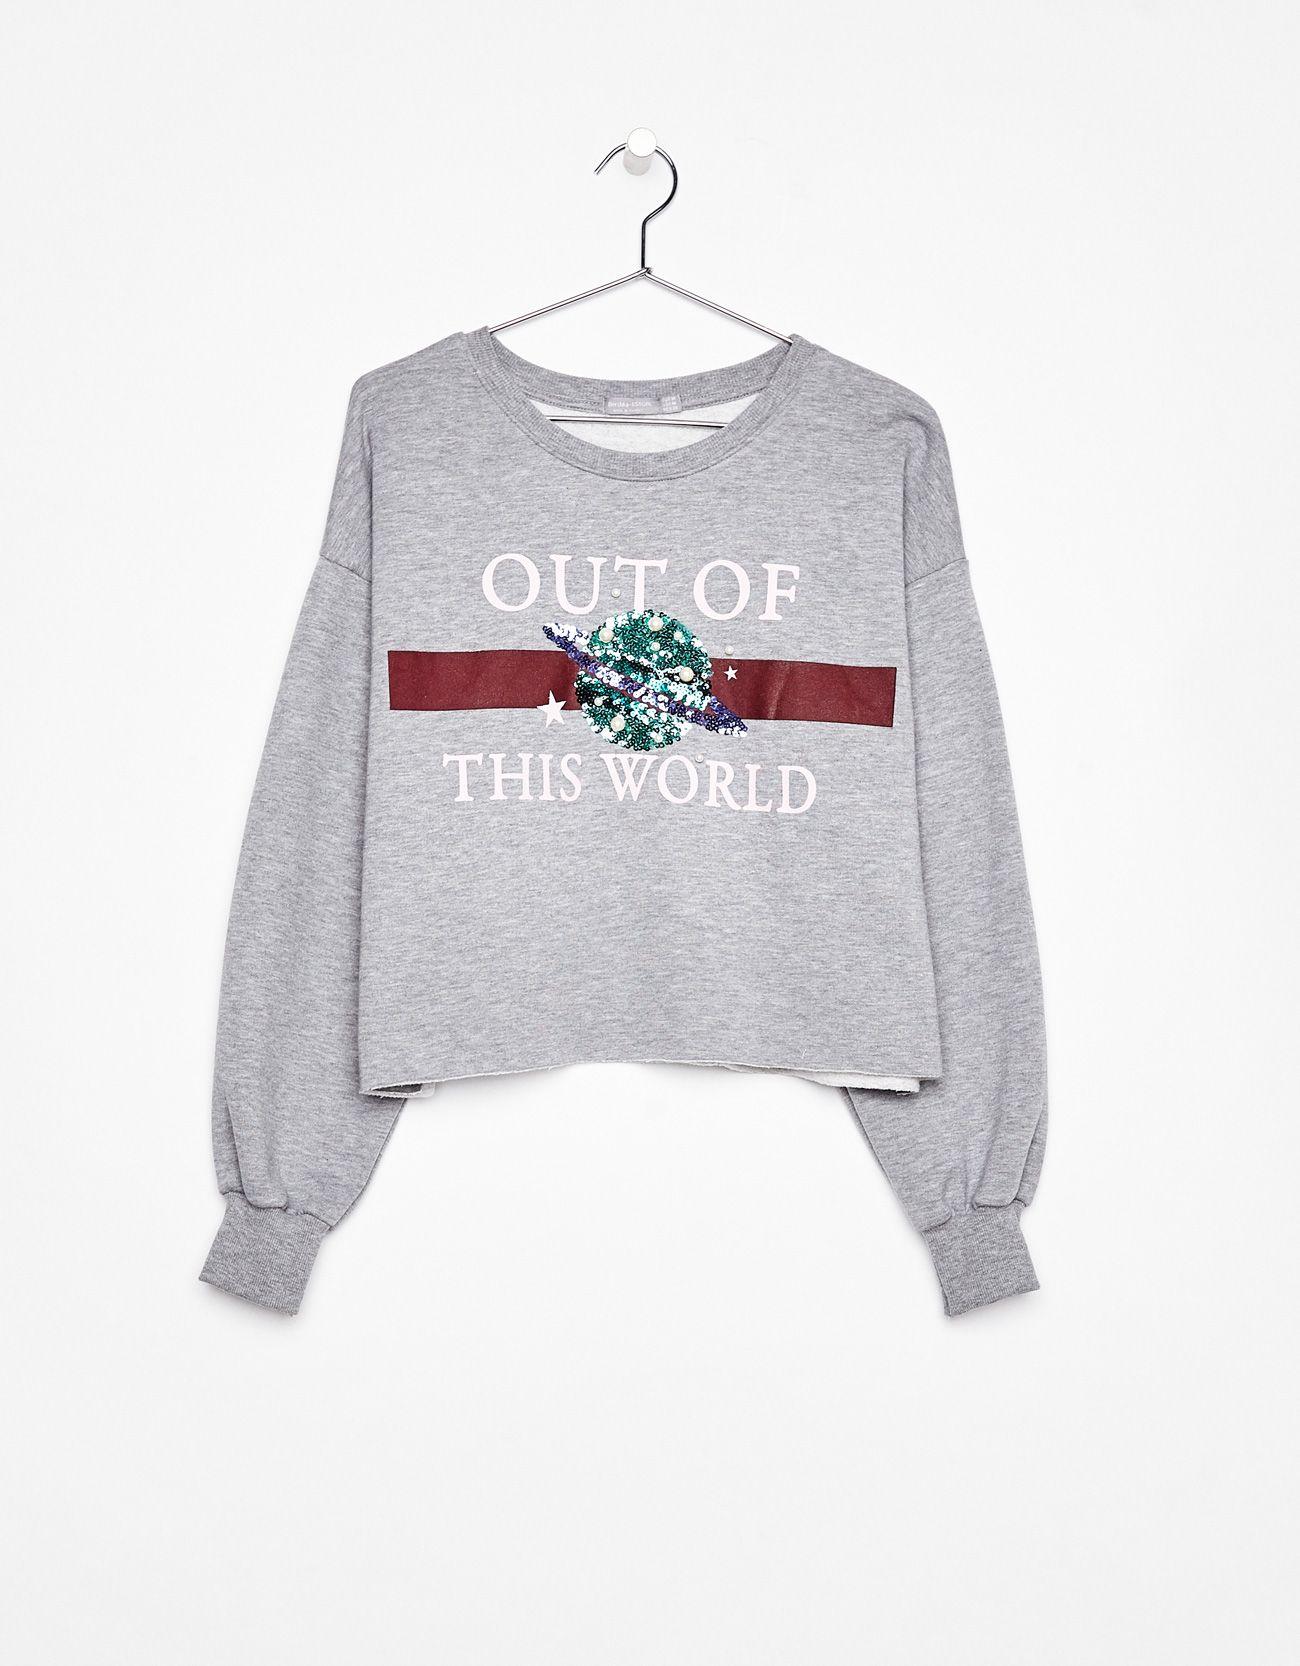 Sweatshirt with slogan in 2019 | Sudaderas bsk | Sweatshirts